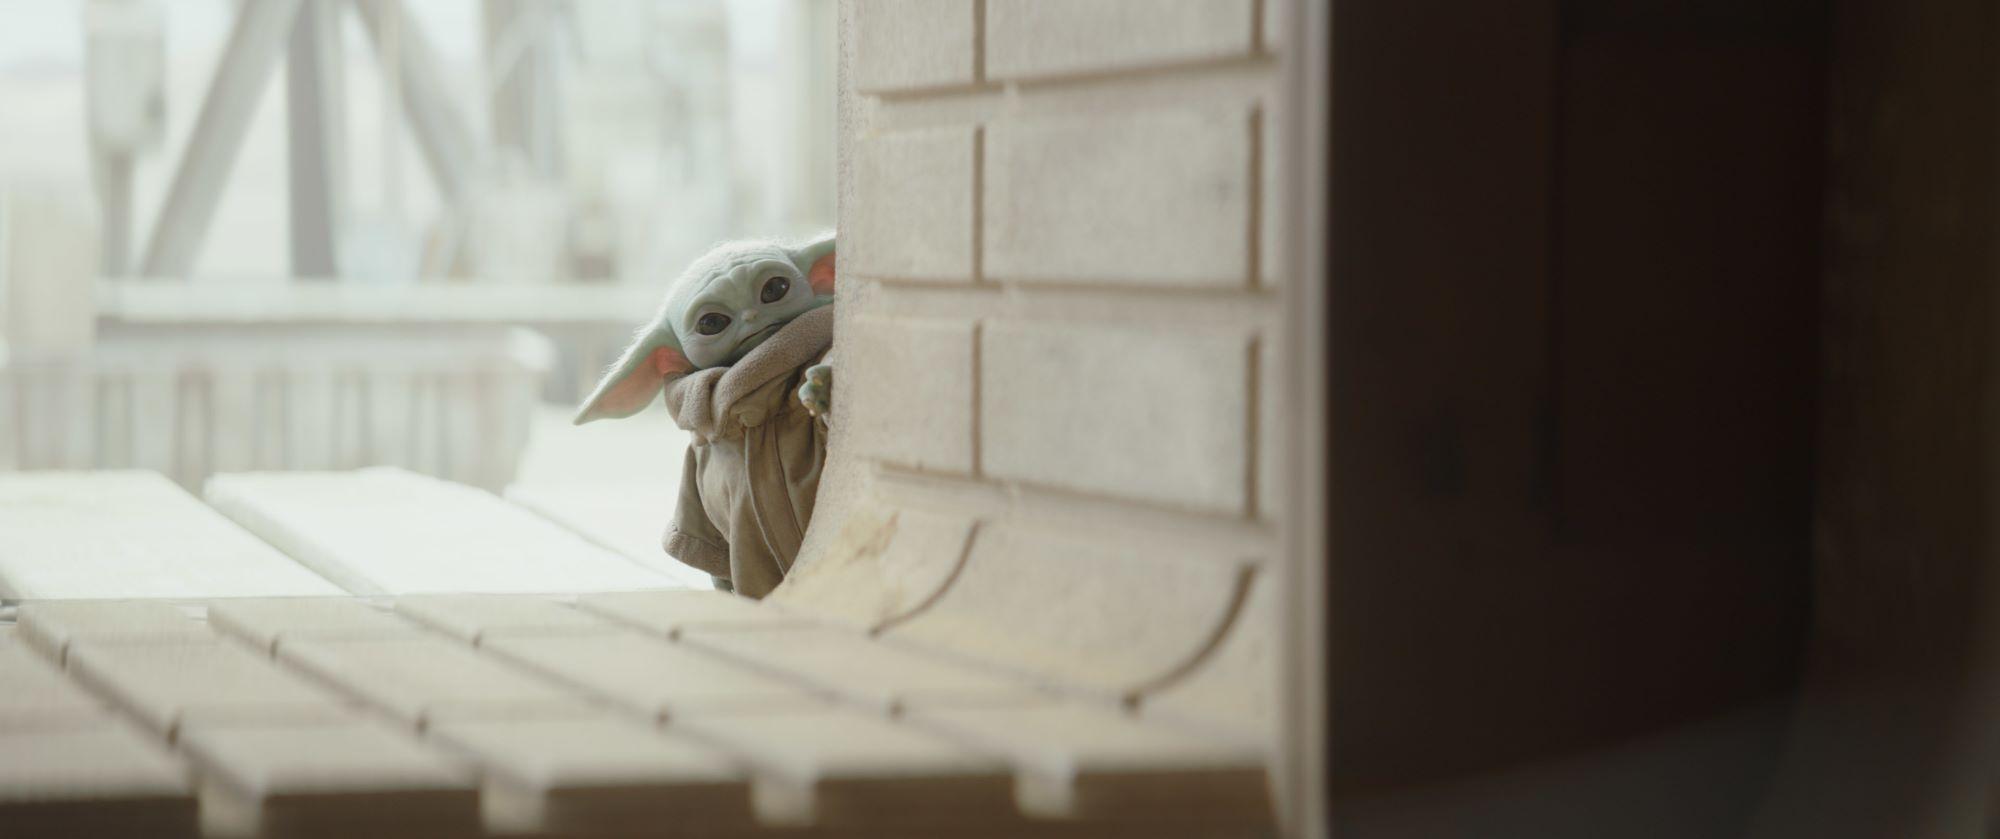 Baby Yoda in 'The Mandalorian'